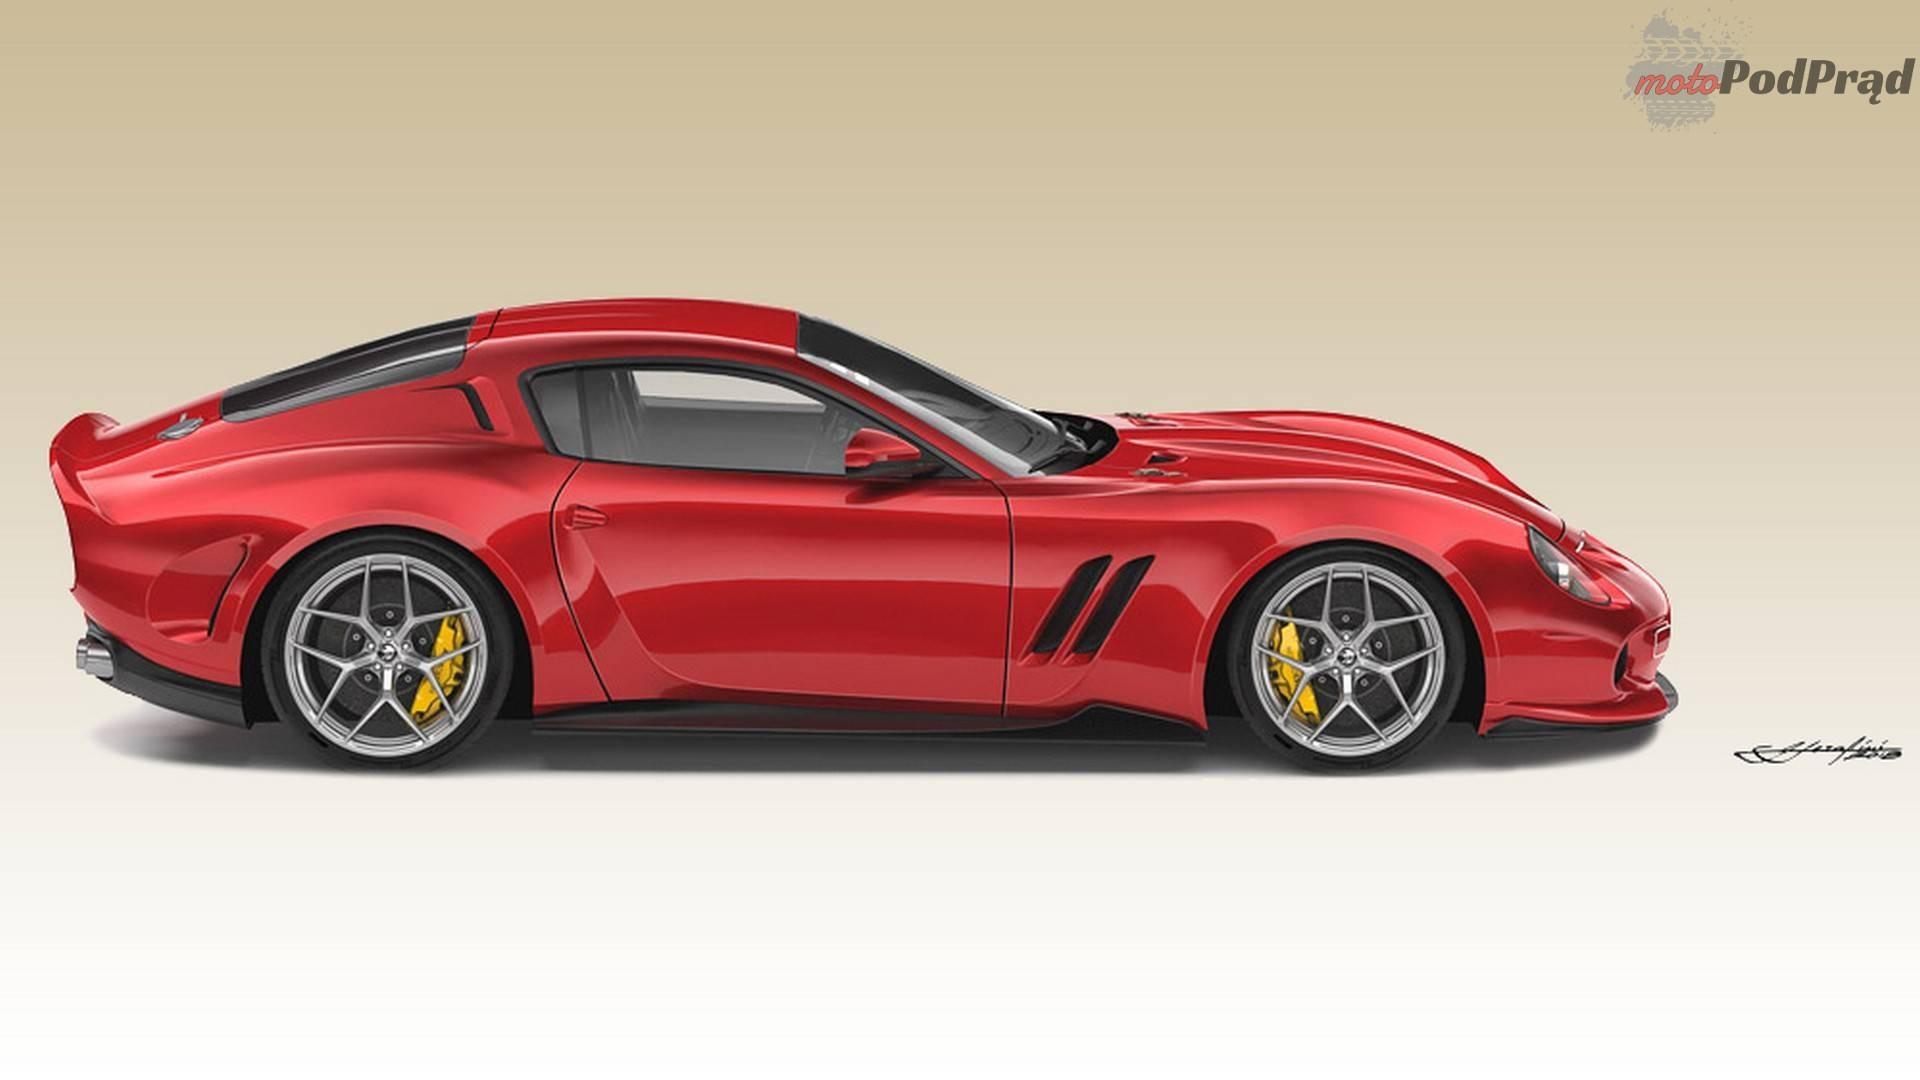 ferrari 812 superfast based 250 gto by ares design 2 Reiknarnacja GTO, której Ferrari nie stworzyło